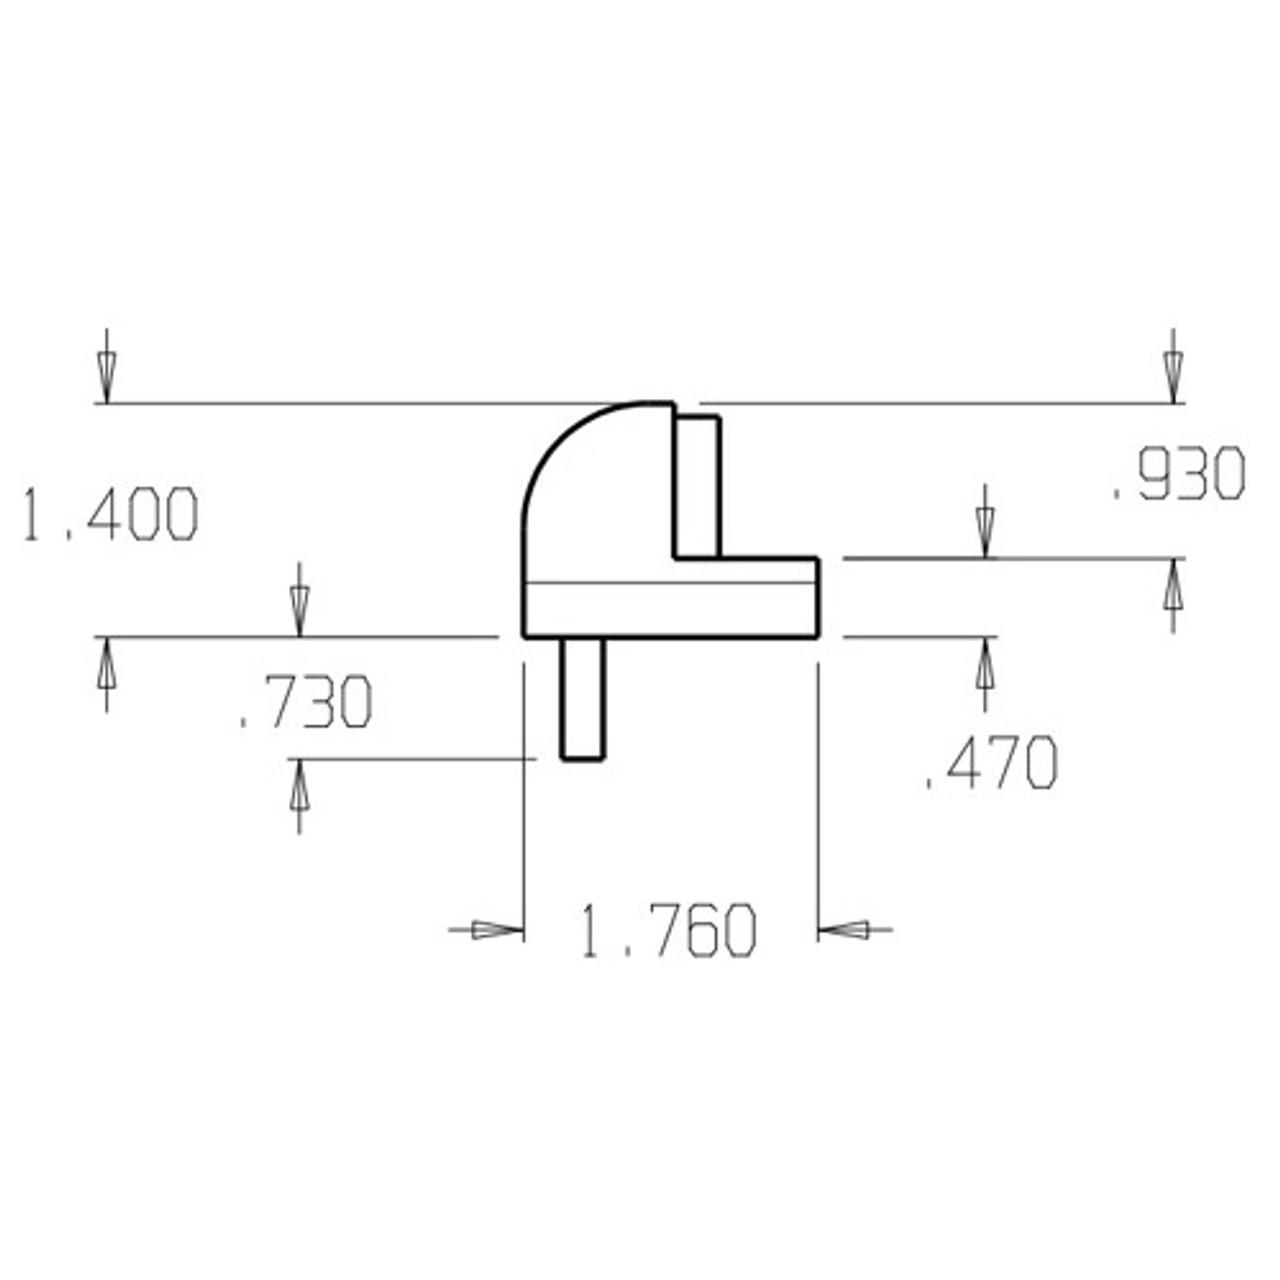 1445-626 Don Jo Floor Stop Dimensional View